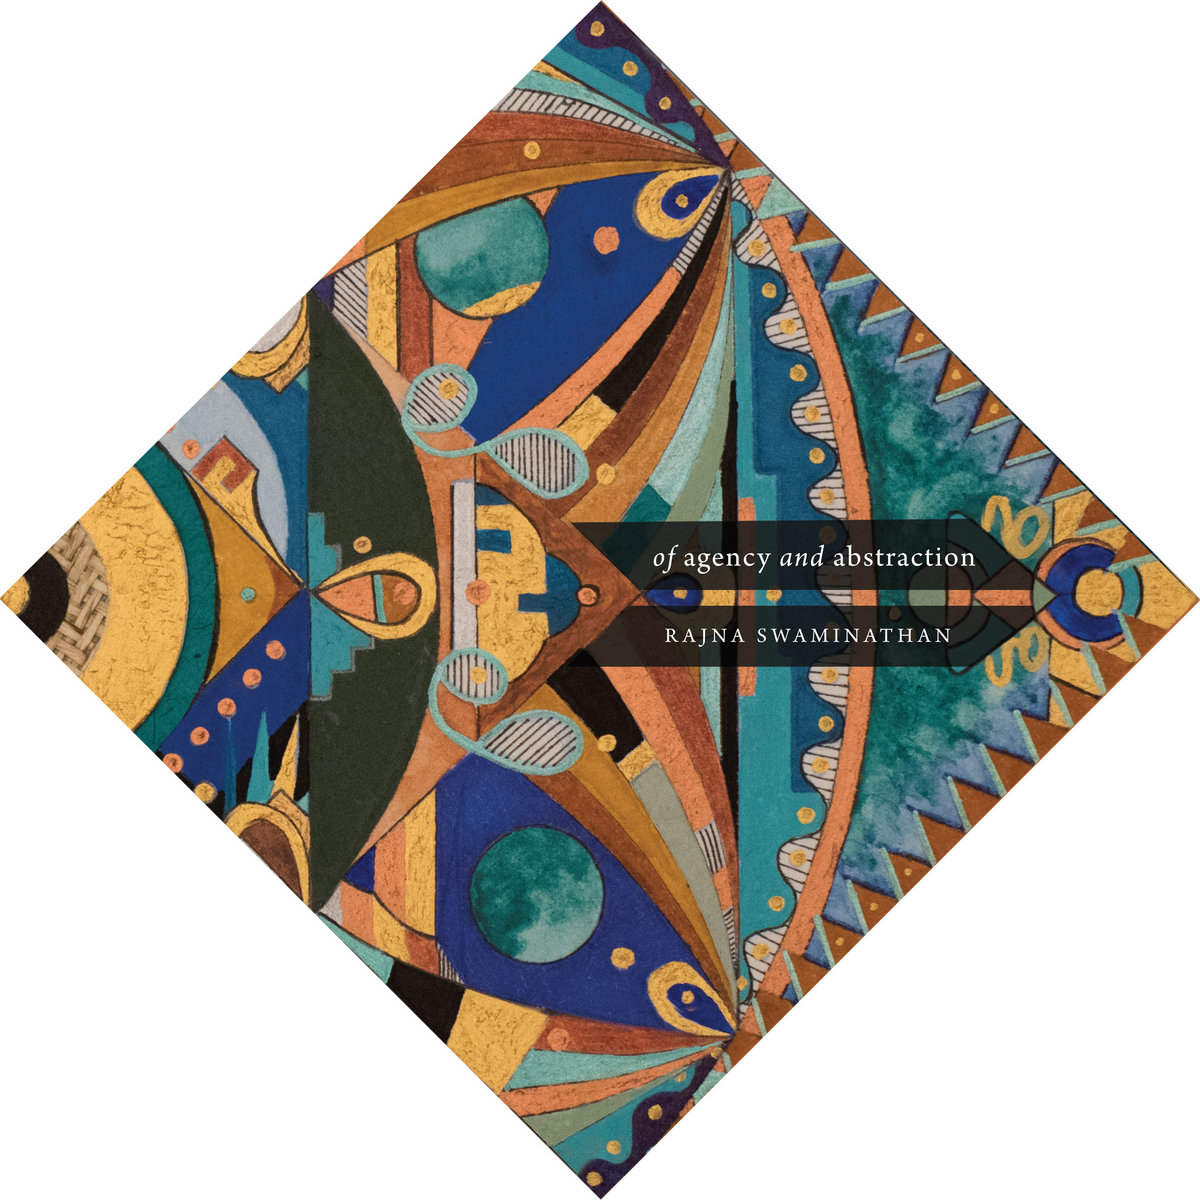 Chasing Abstraction >> Chasing The Gradient Rajna Swaminathan